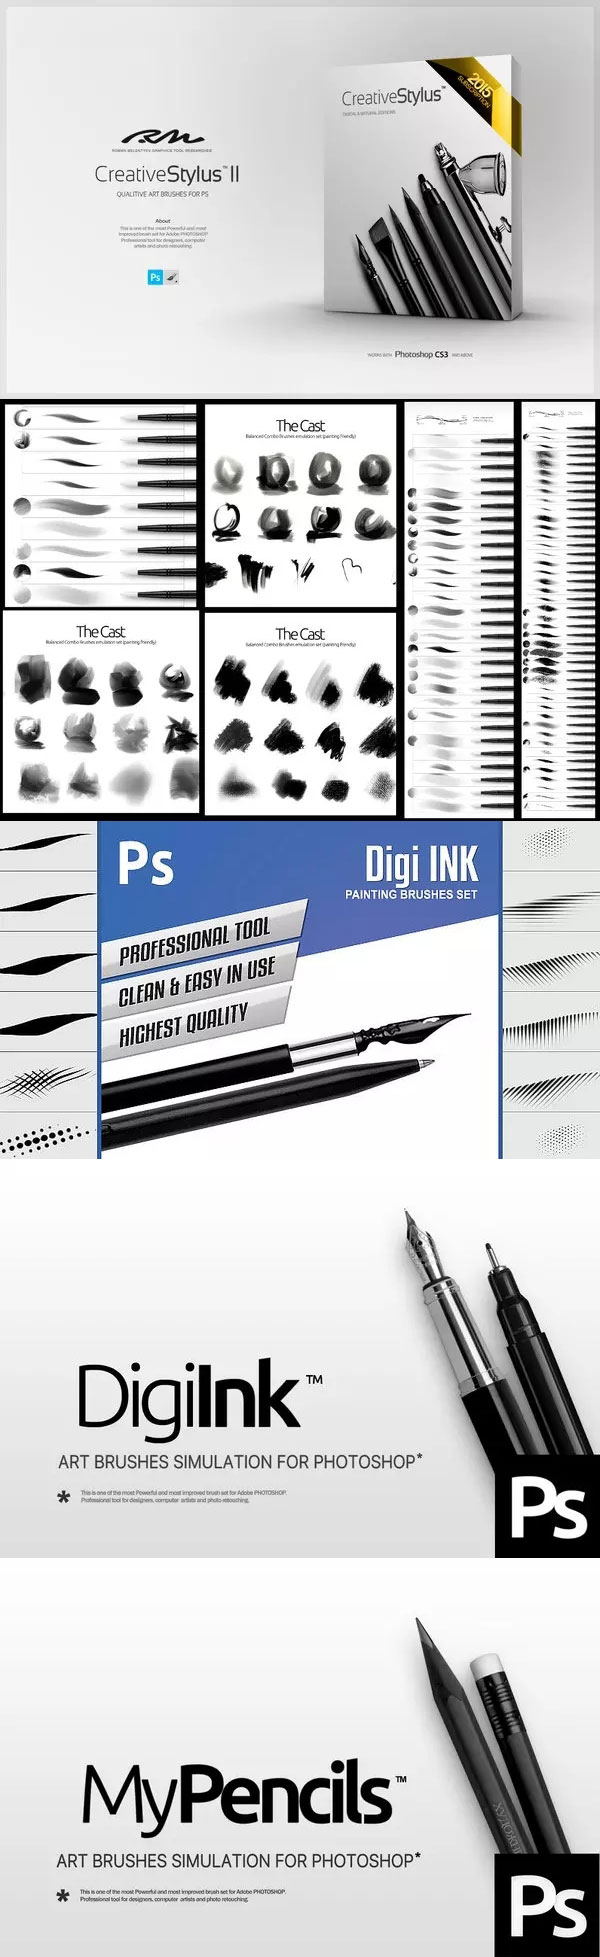 PS笔刷和设置合集